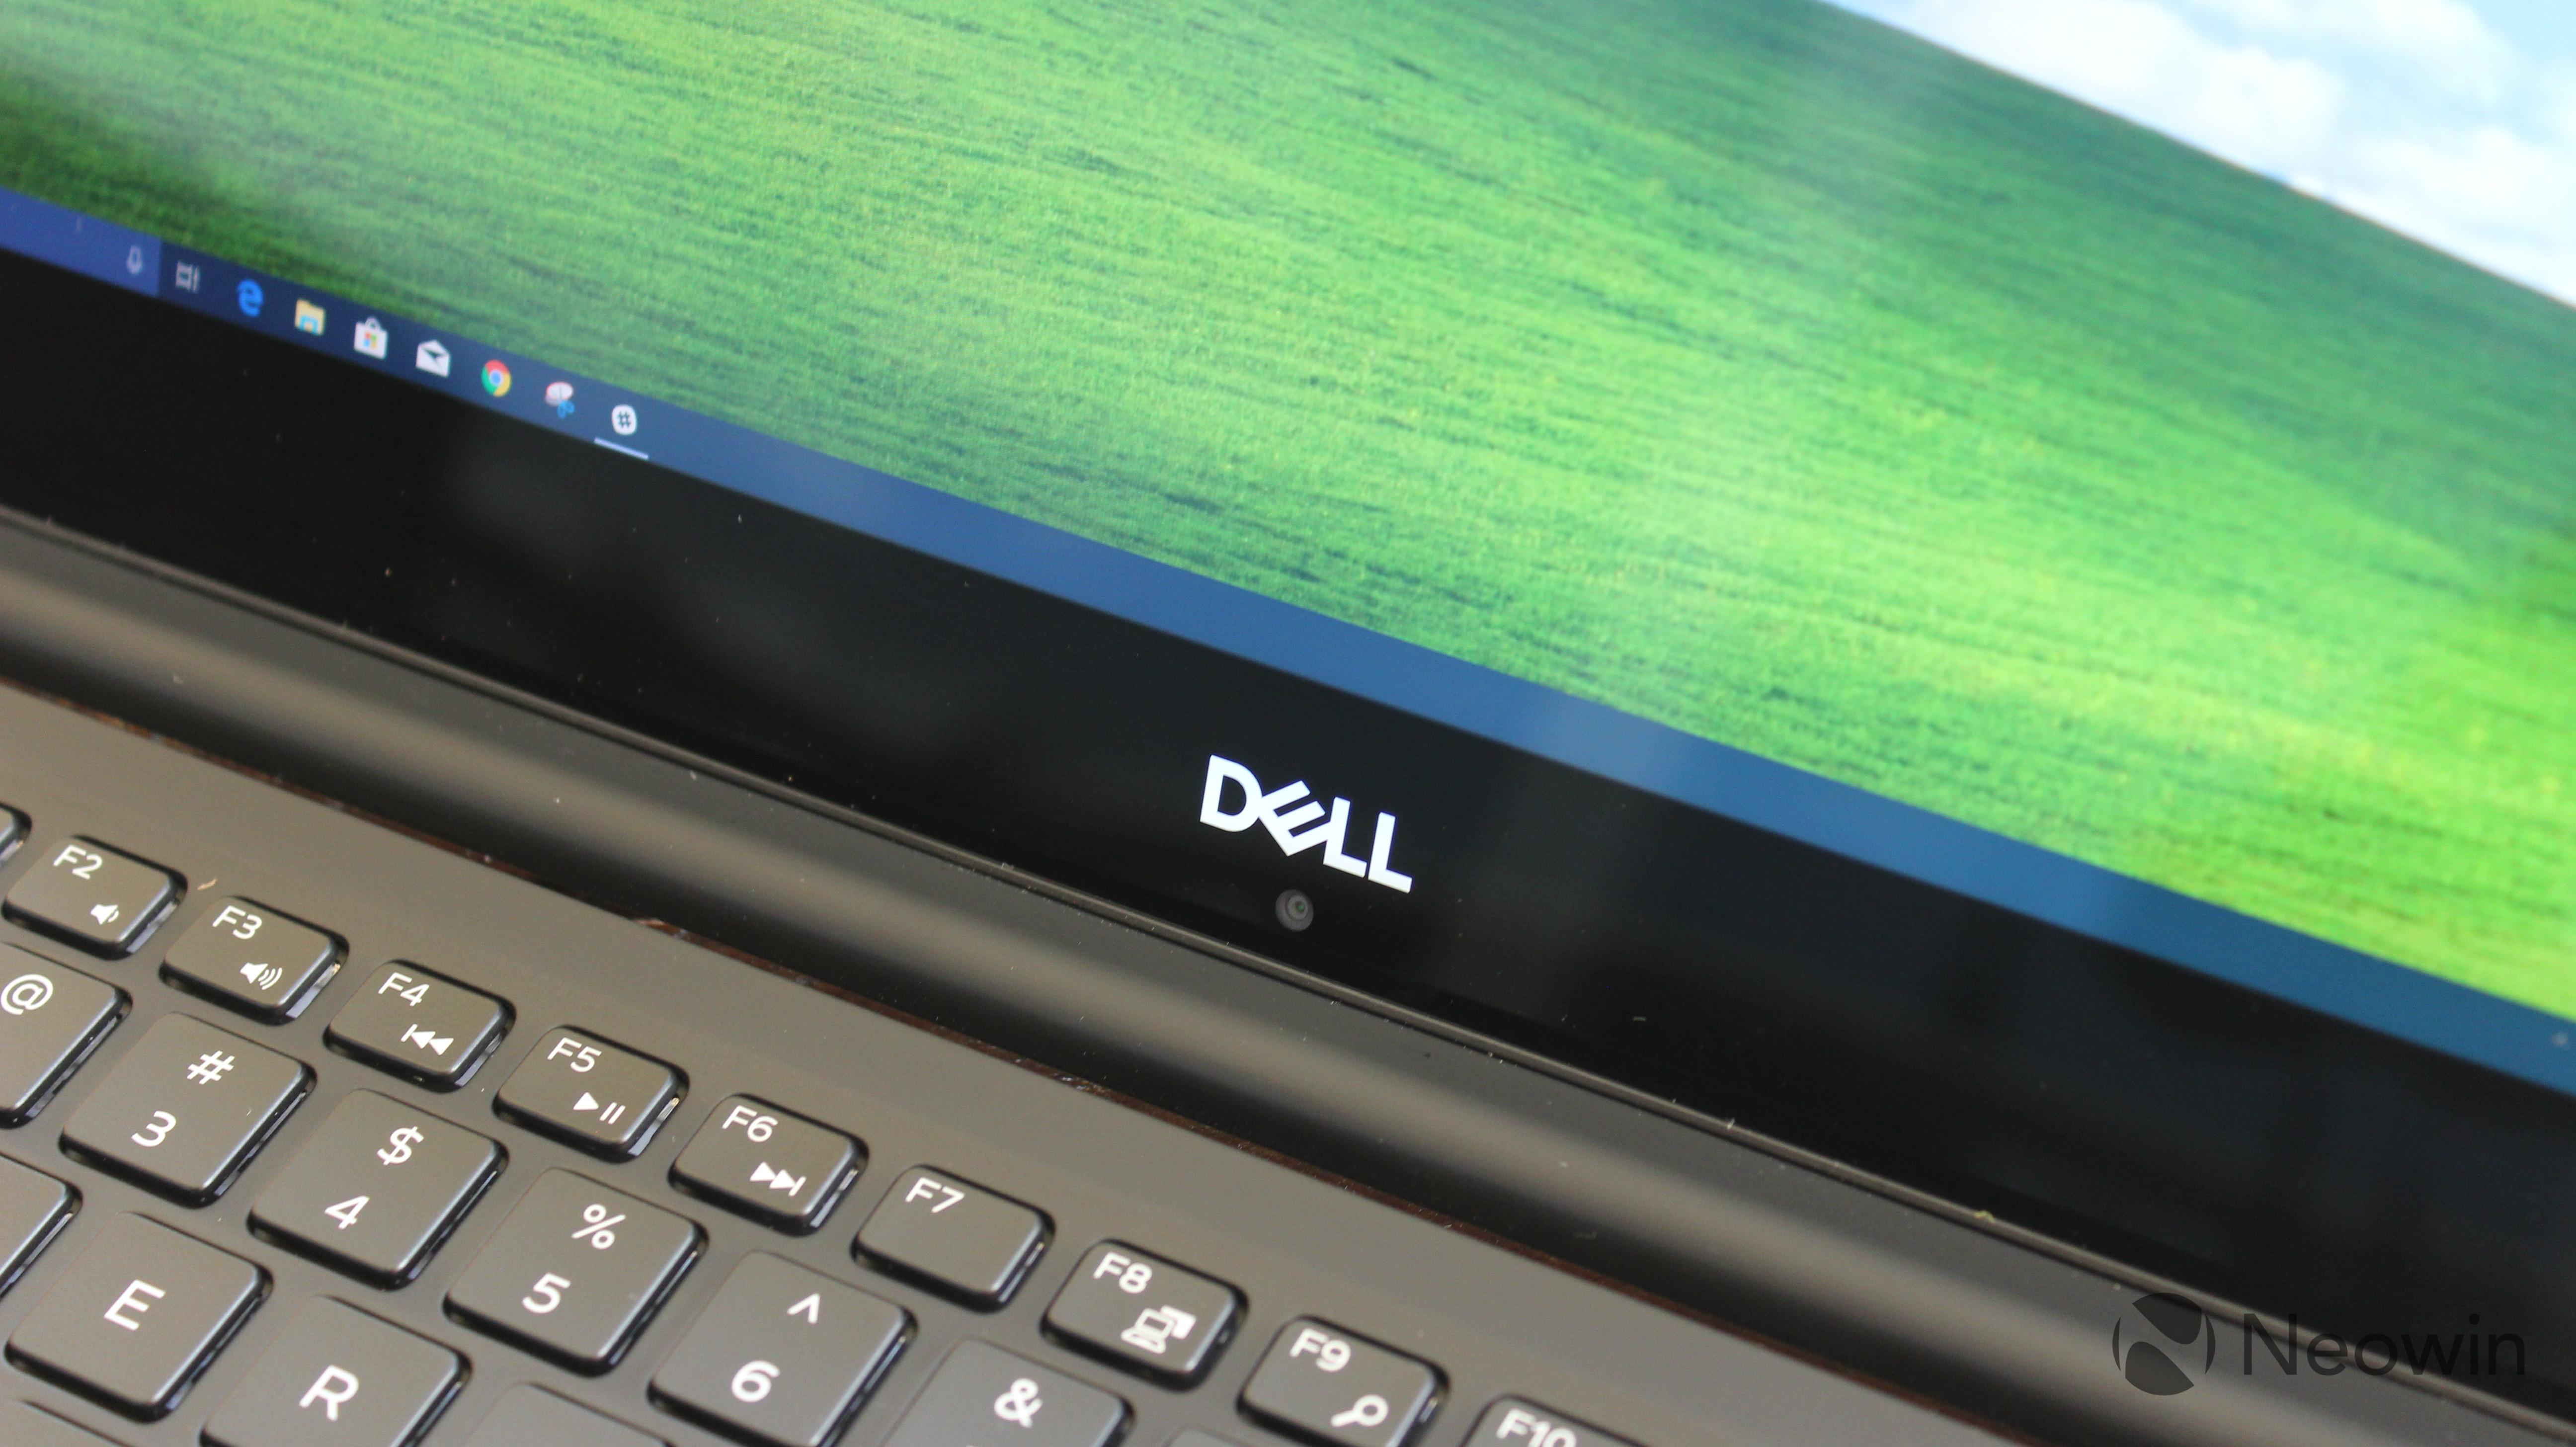 Dell XPS 15 review: Core i9-8950HK + Nvidia graphics + 4K HDR + 32GB